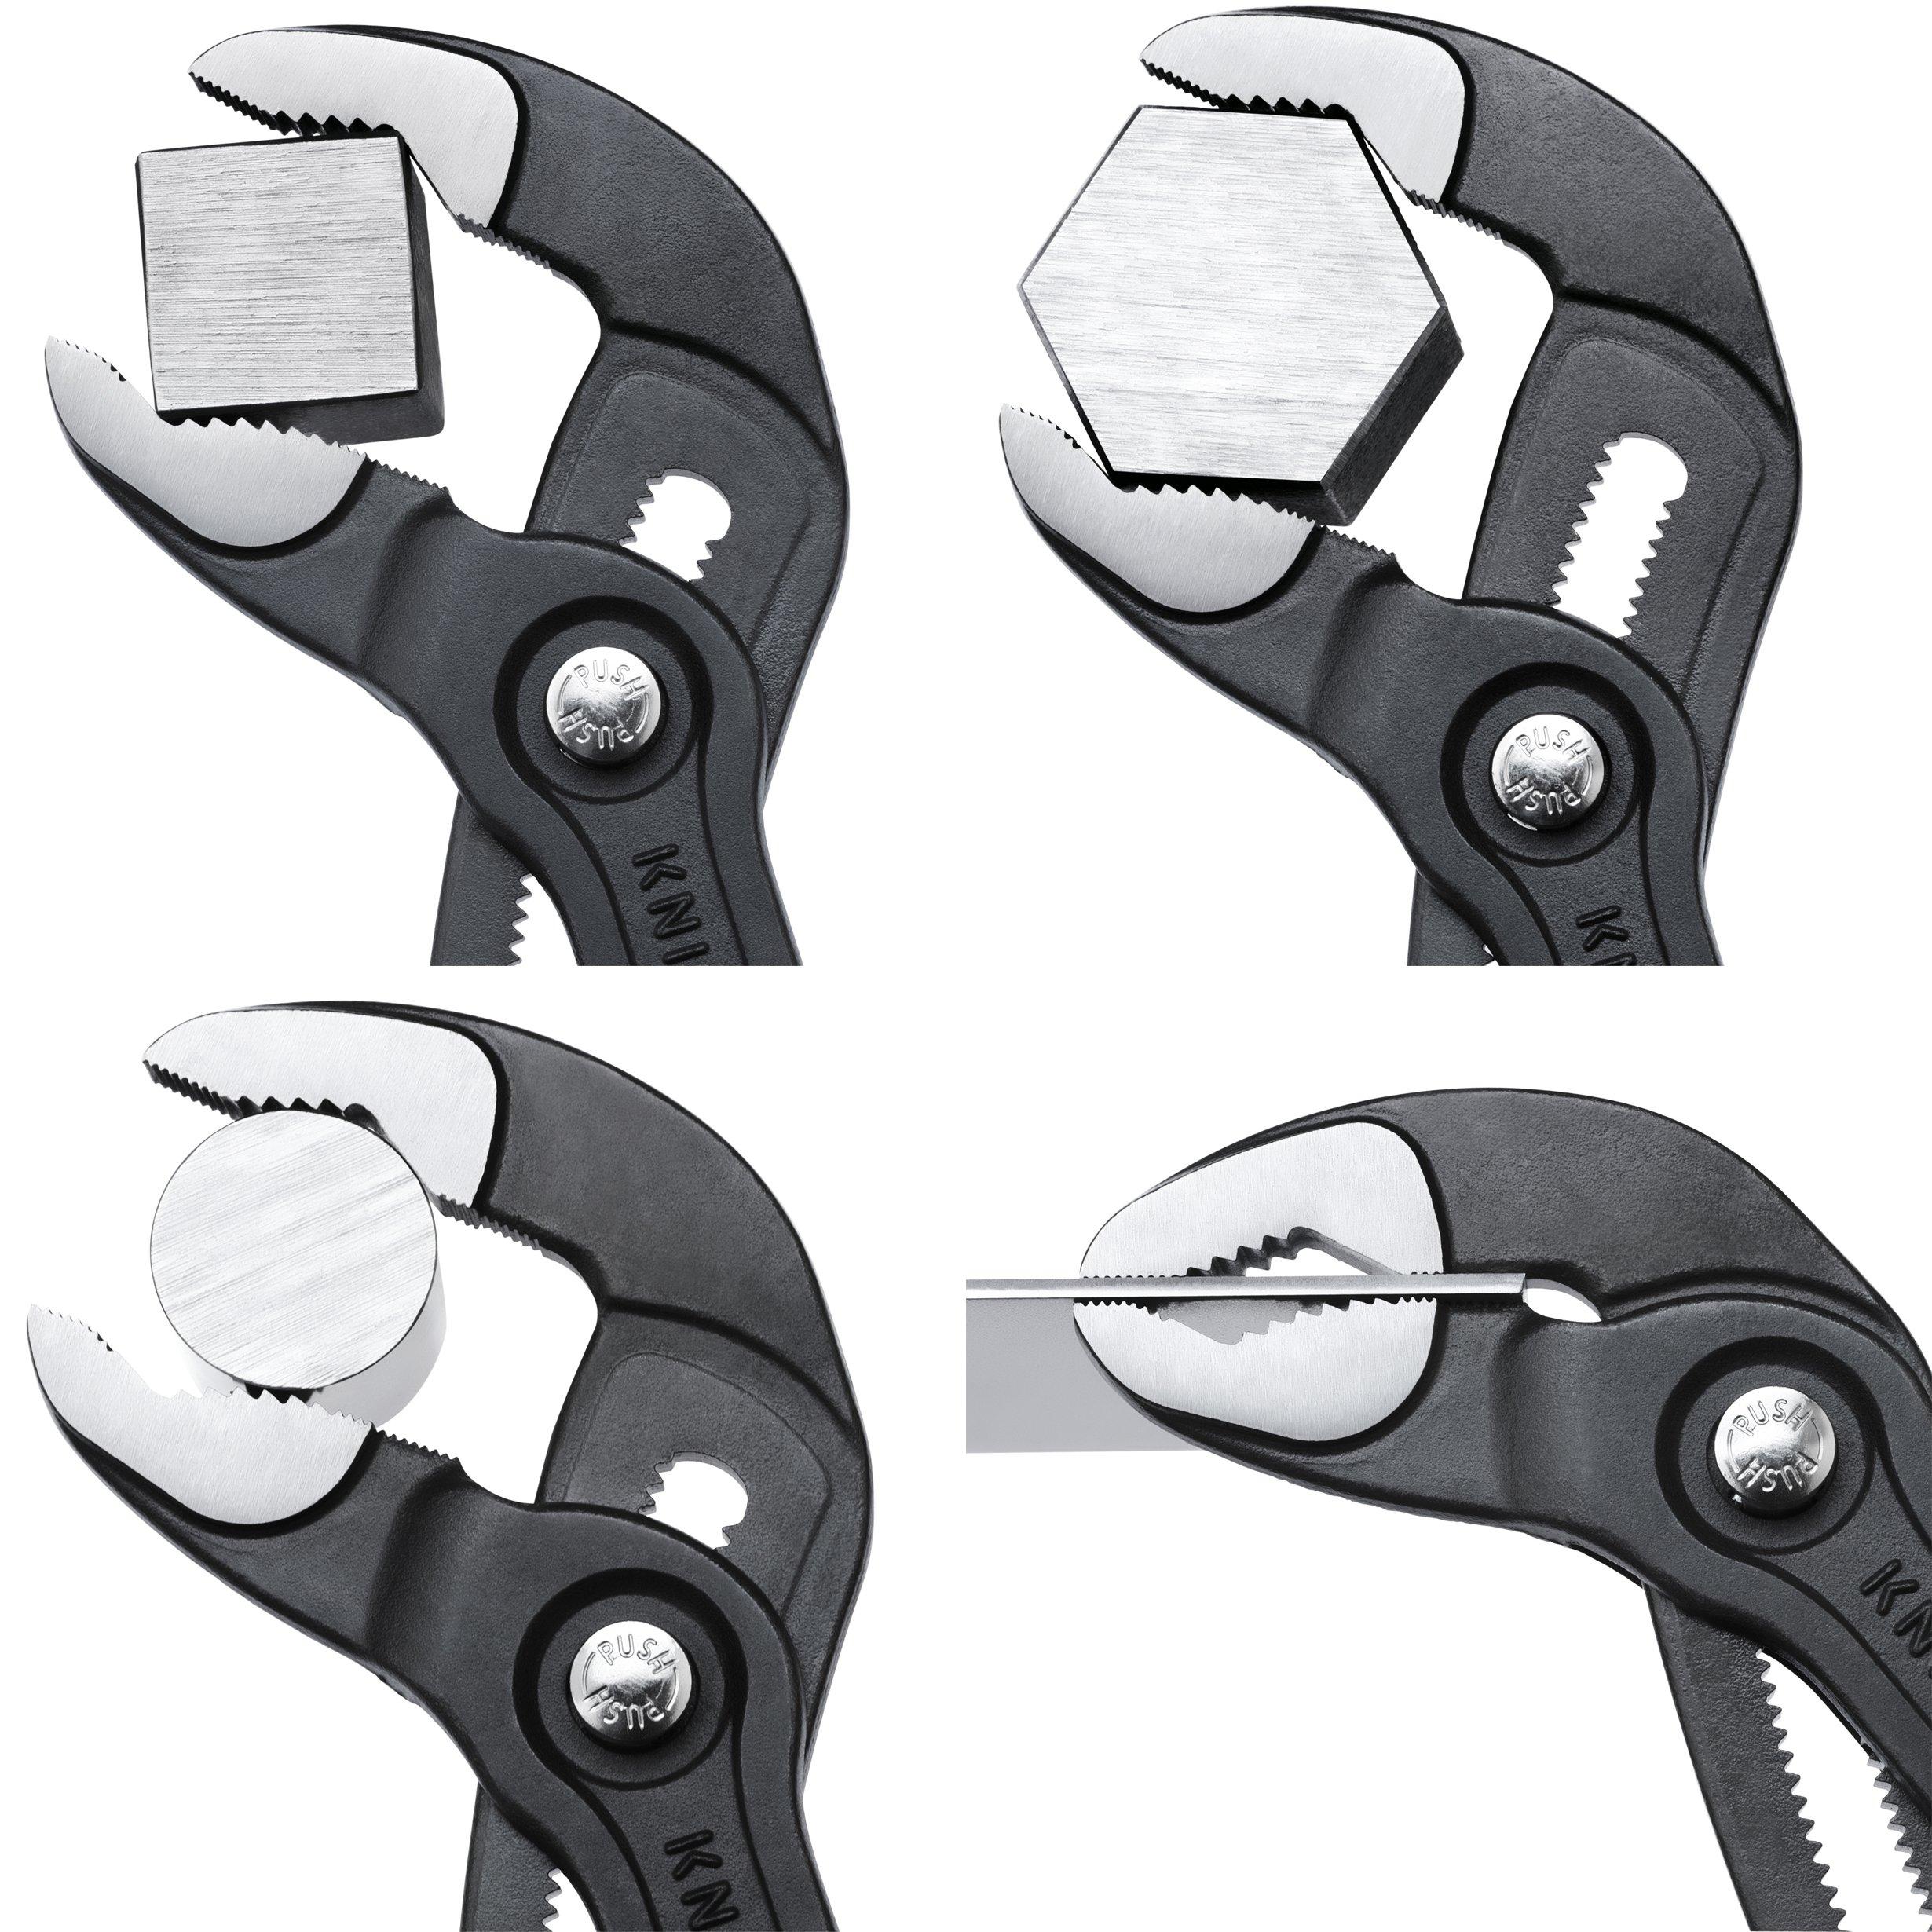 Knipex 8701400 16-Inch Cobra Pliers